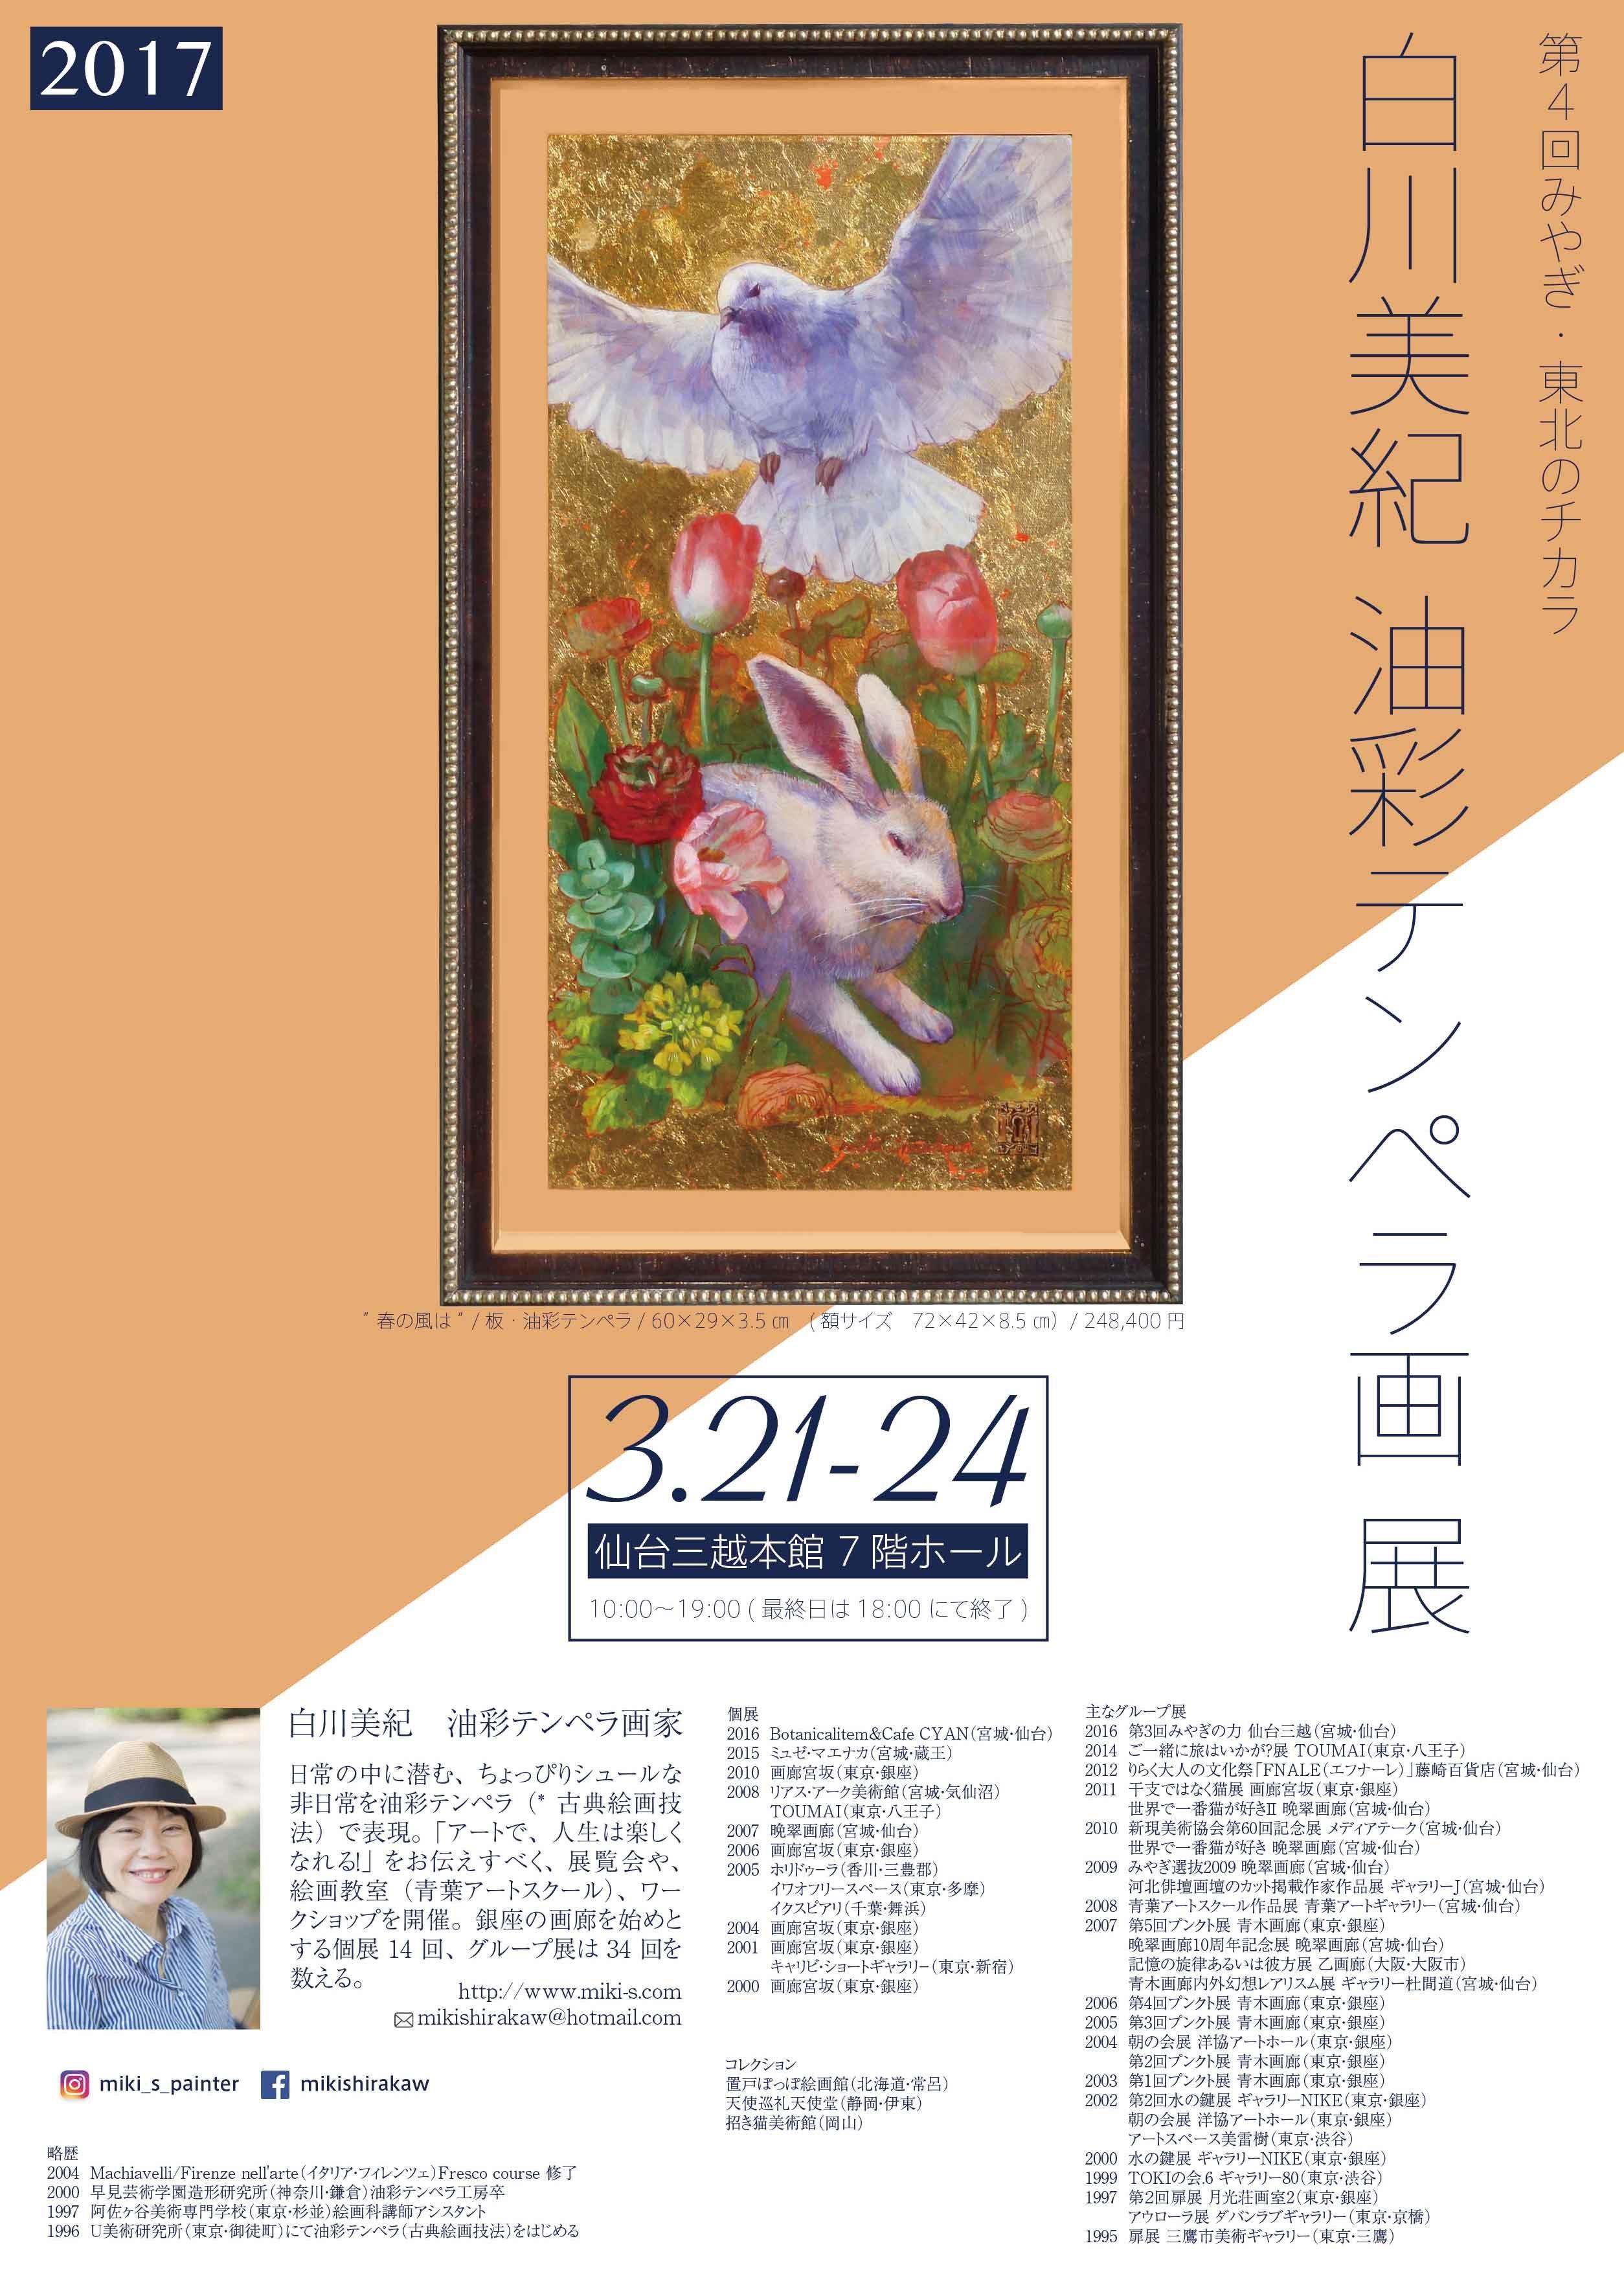 A4_shirakawadm_20170220_omote.jpg